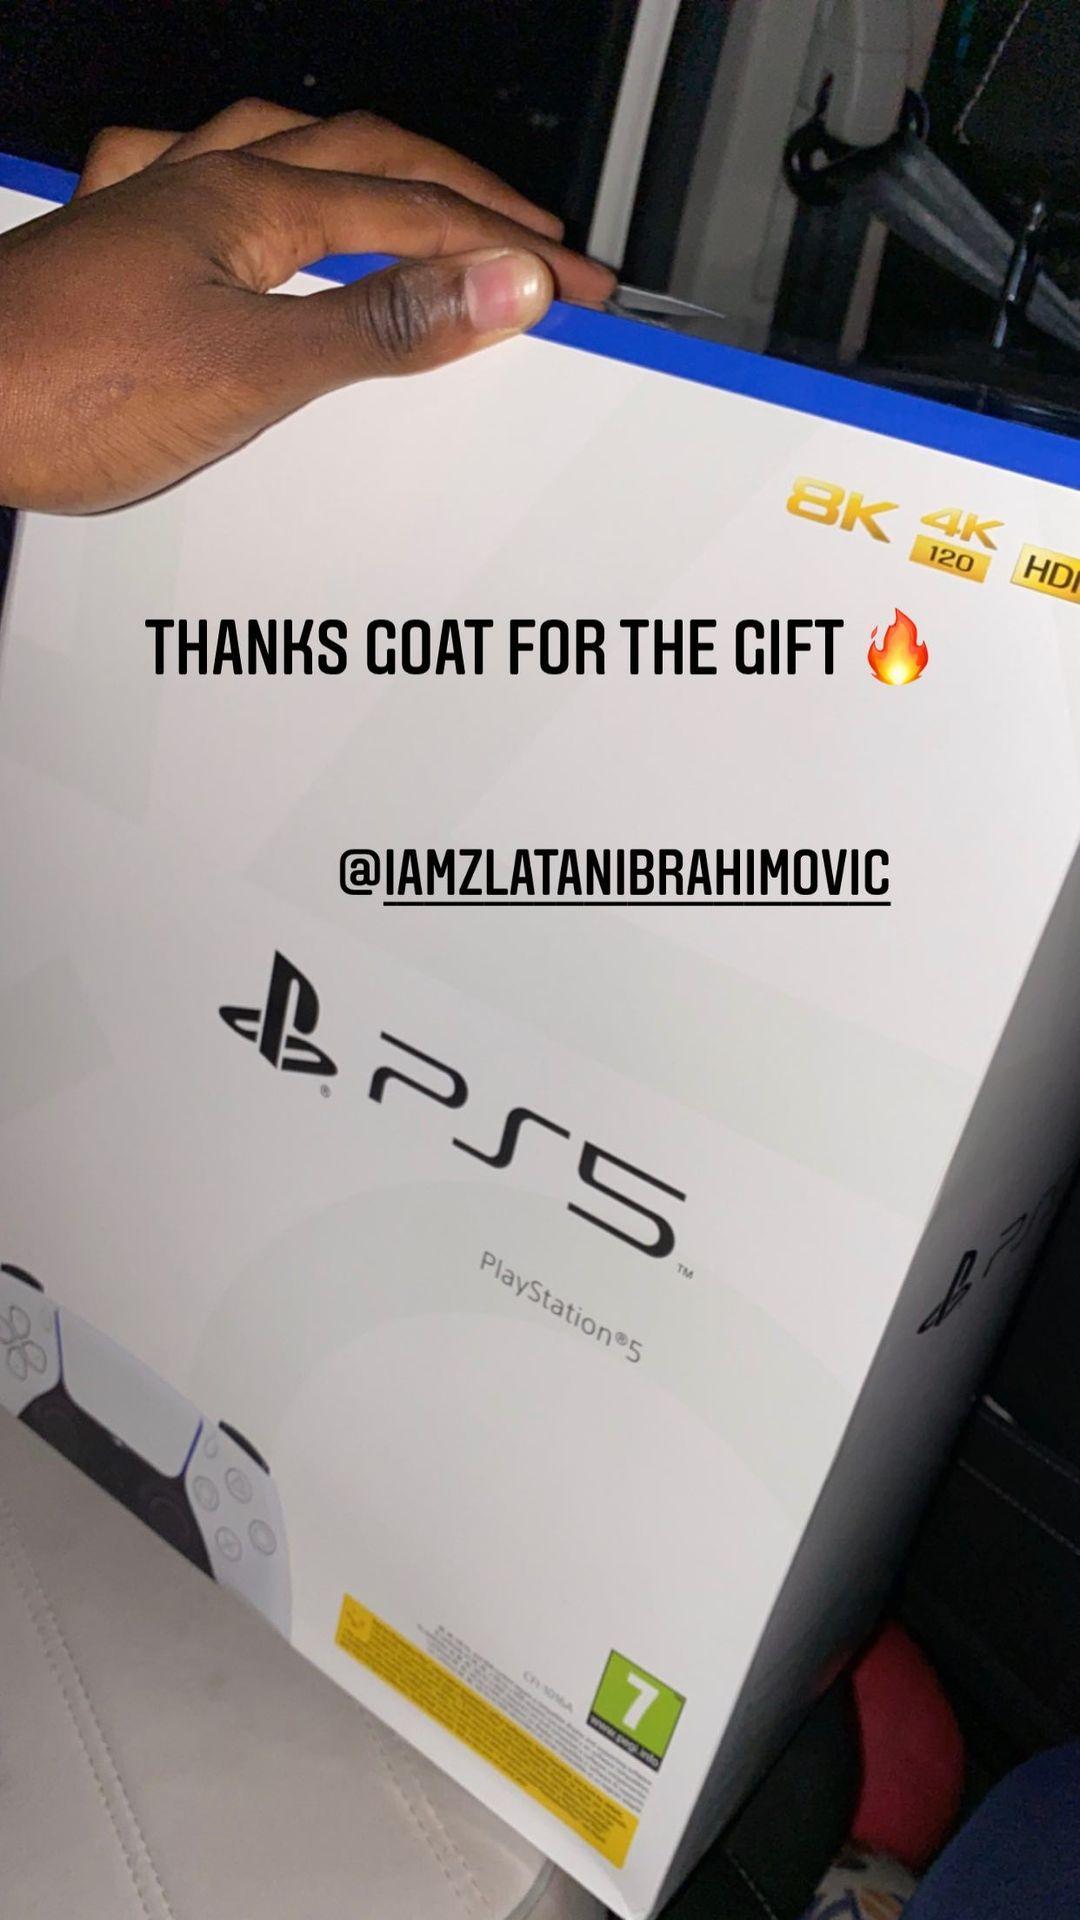 AC Milan forward Rafael Leao also thanked Ibrahimovic for his generous gift